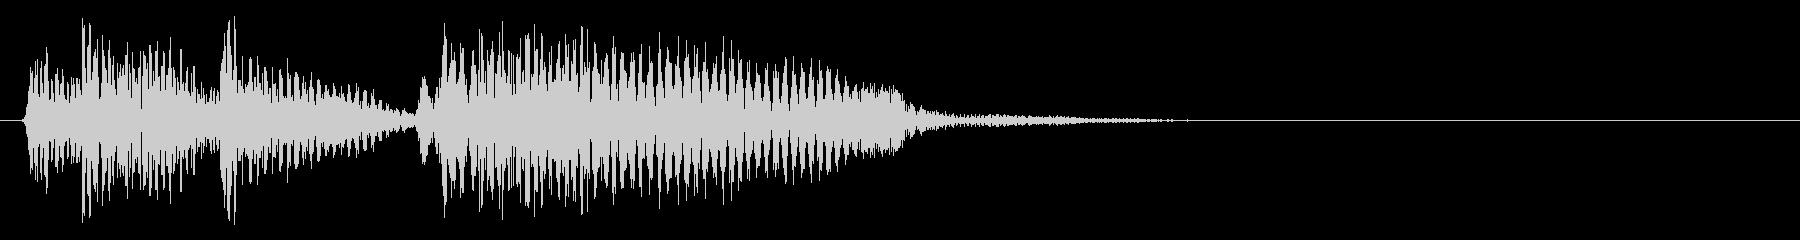 JAZZ BASS切り替え場面ジングの未再生の波形